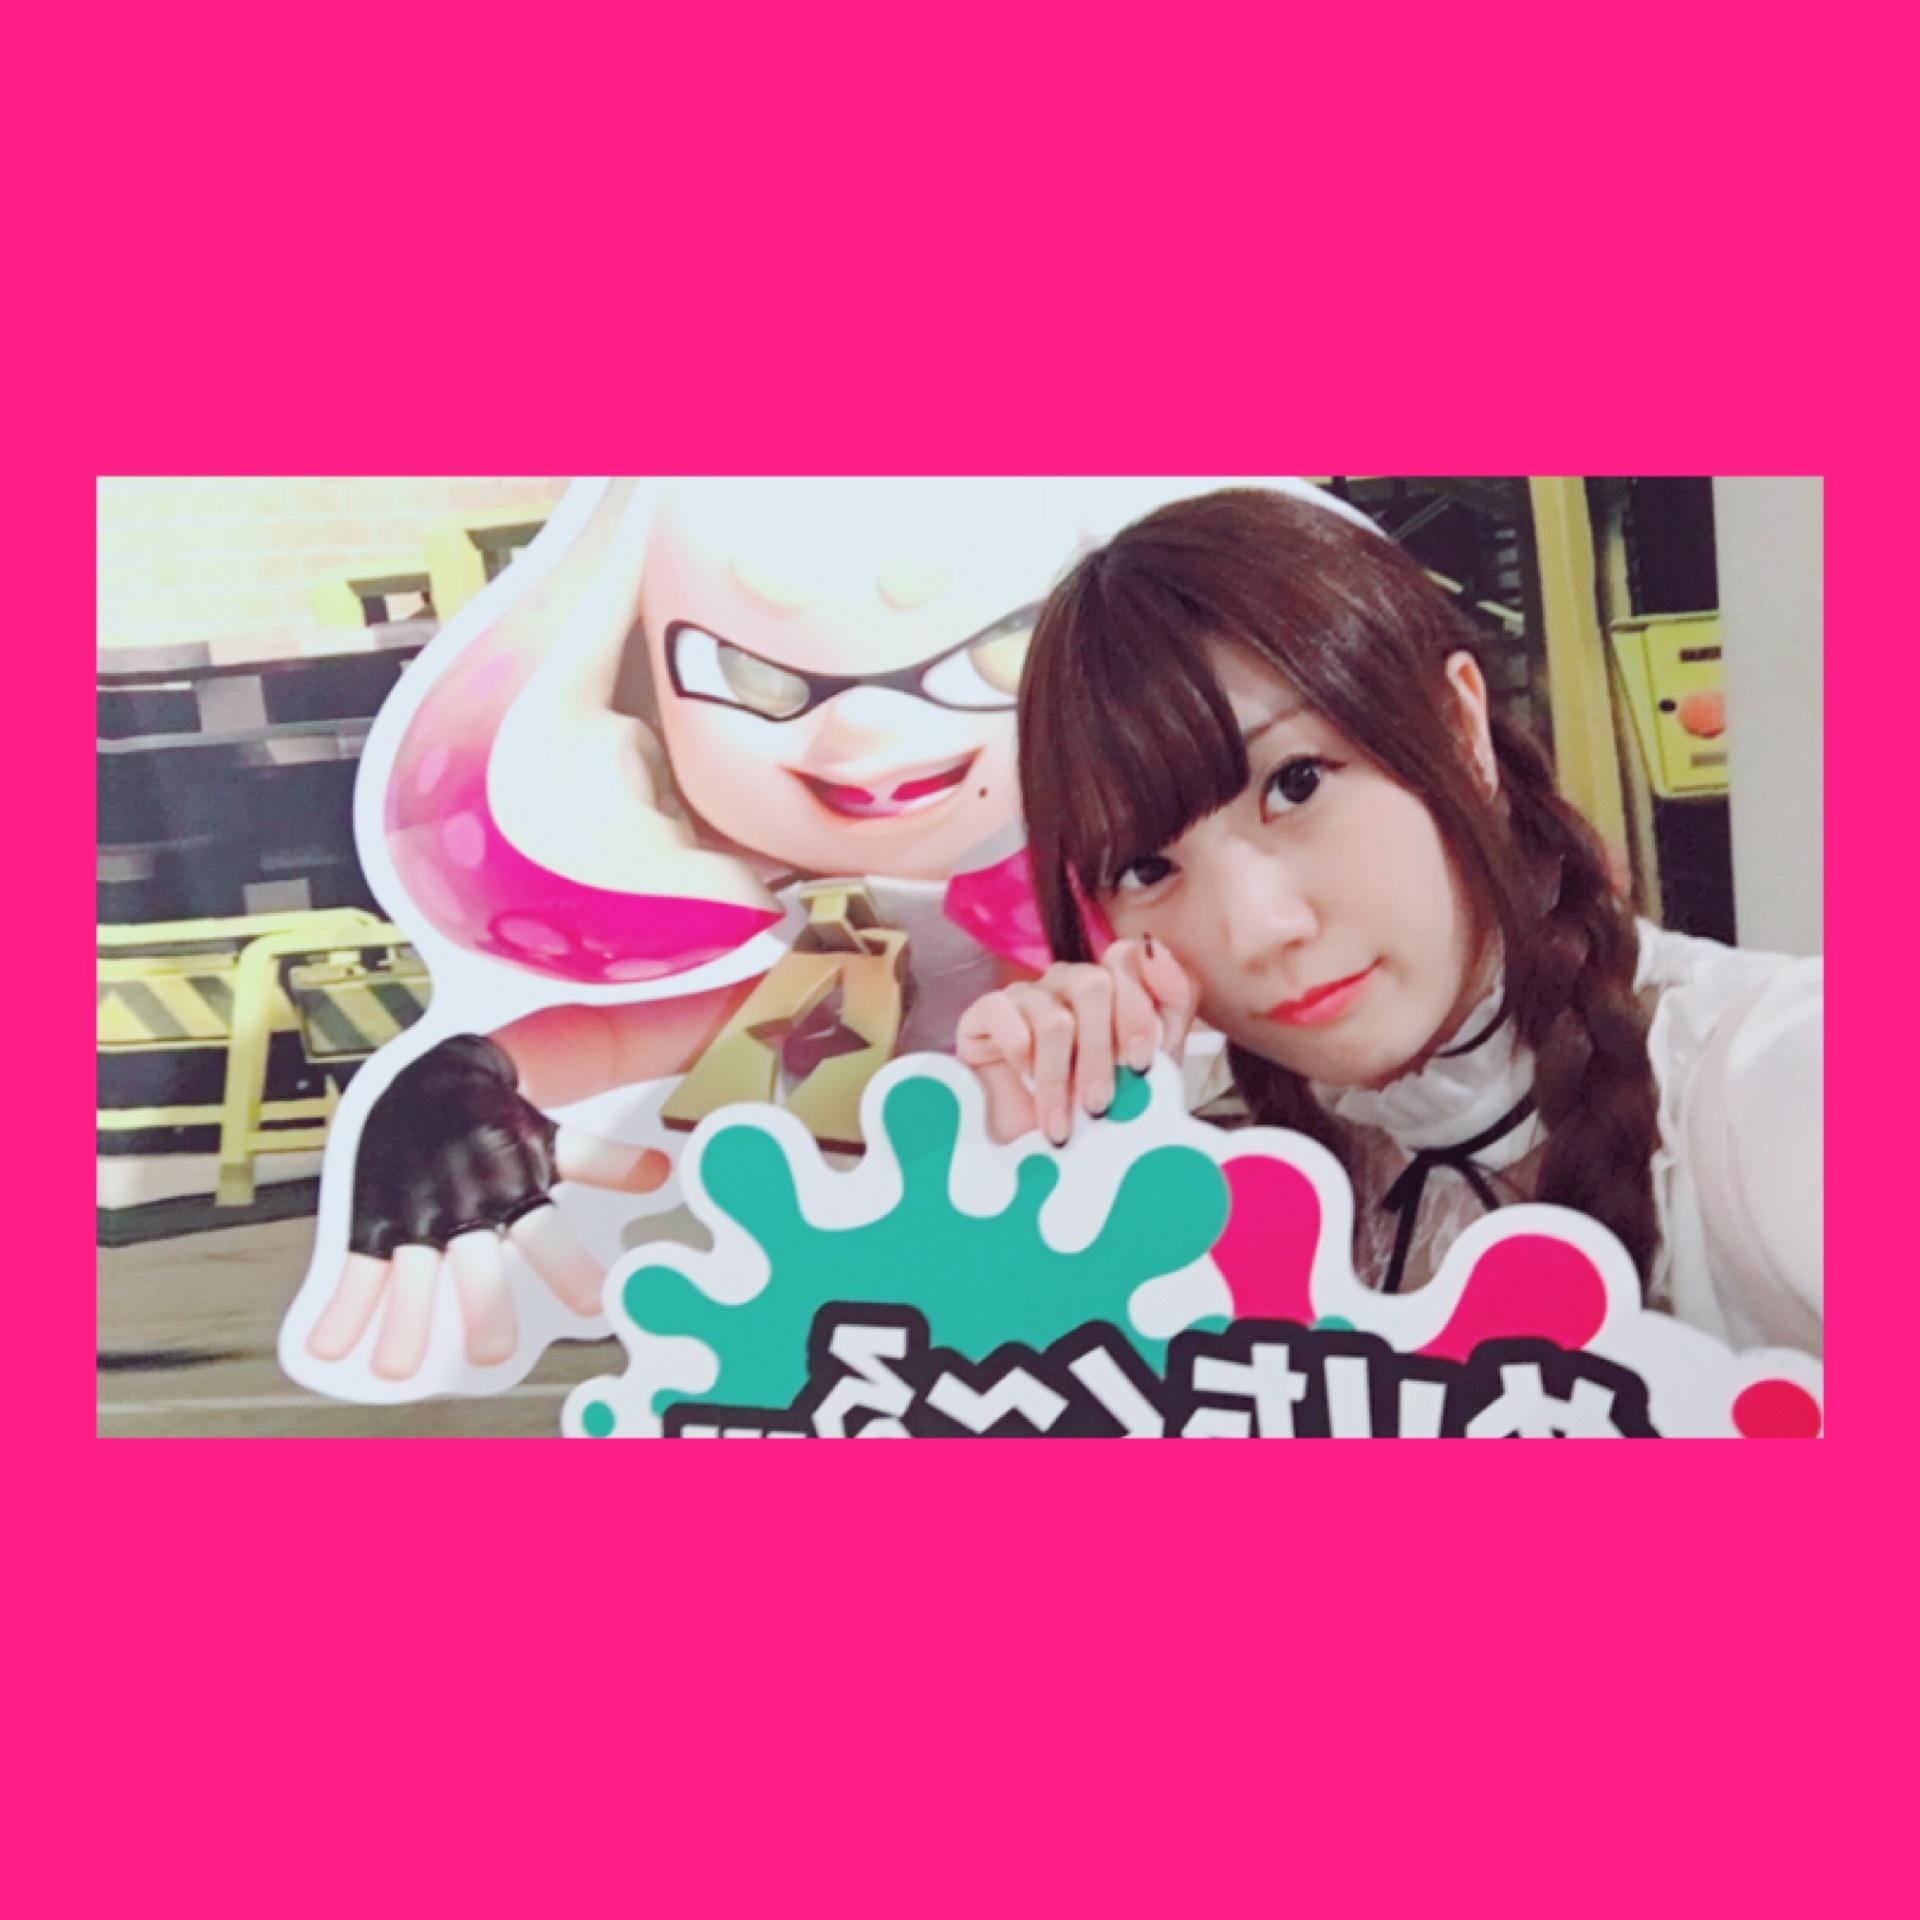 【Splatoon展】Shibuyaタワレコに行ってきました♡_1_4-2